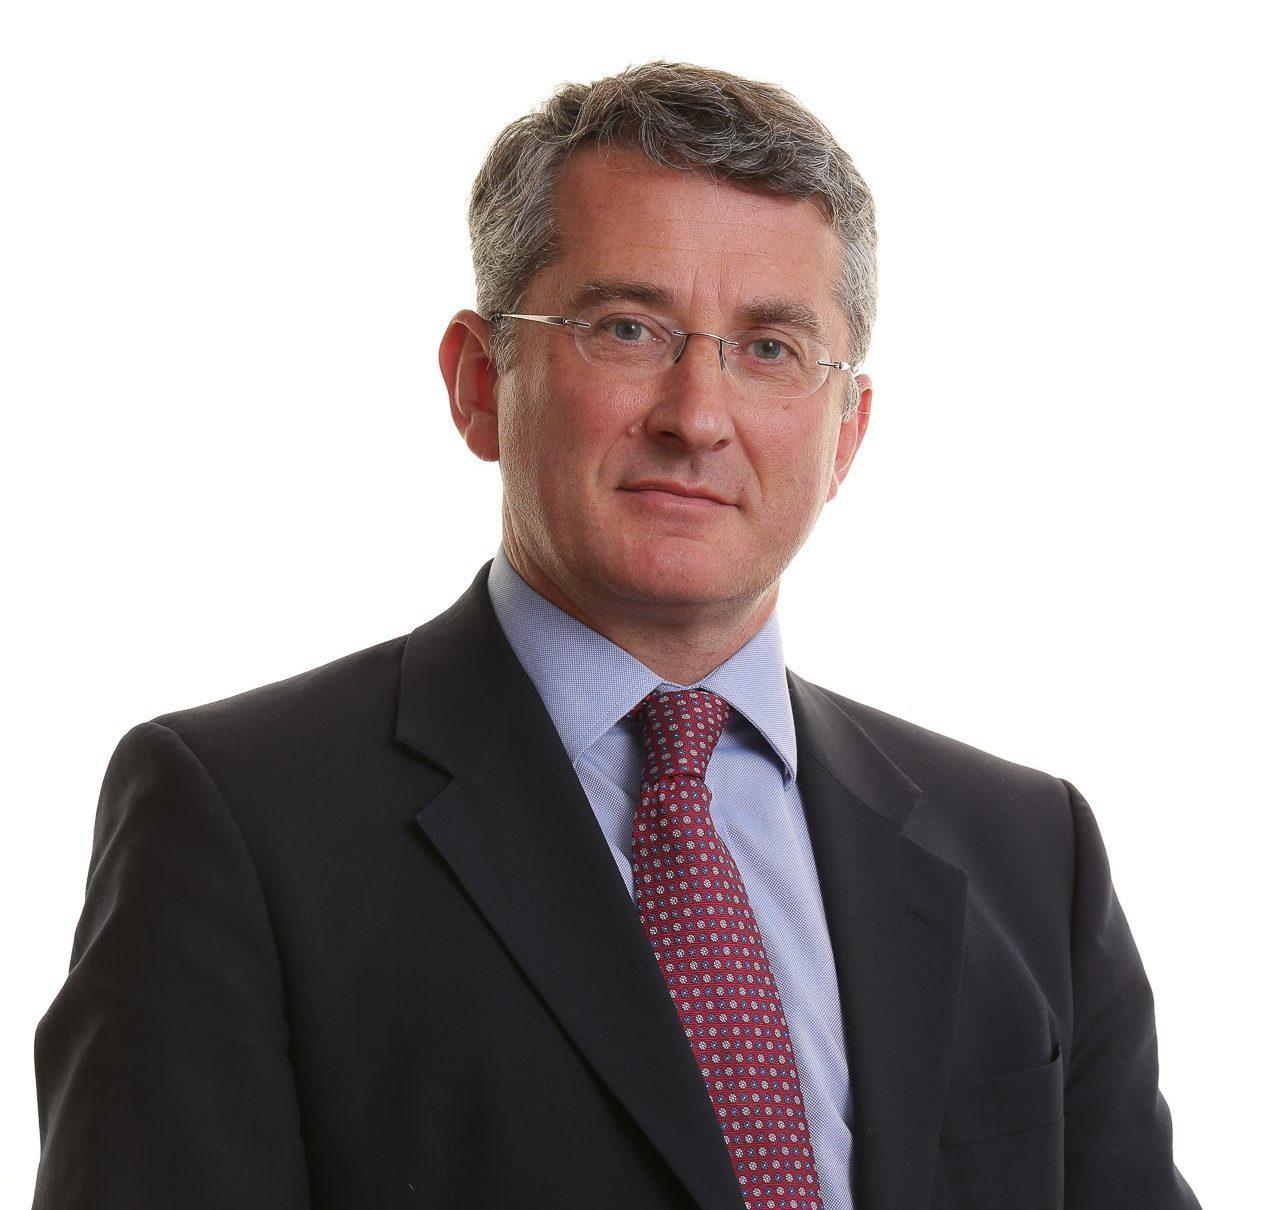 Charles Proctor